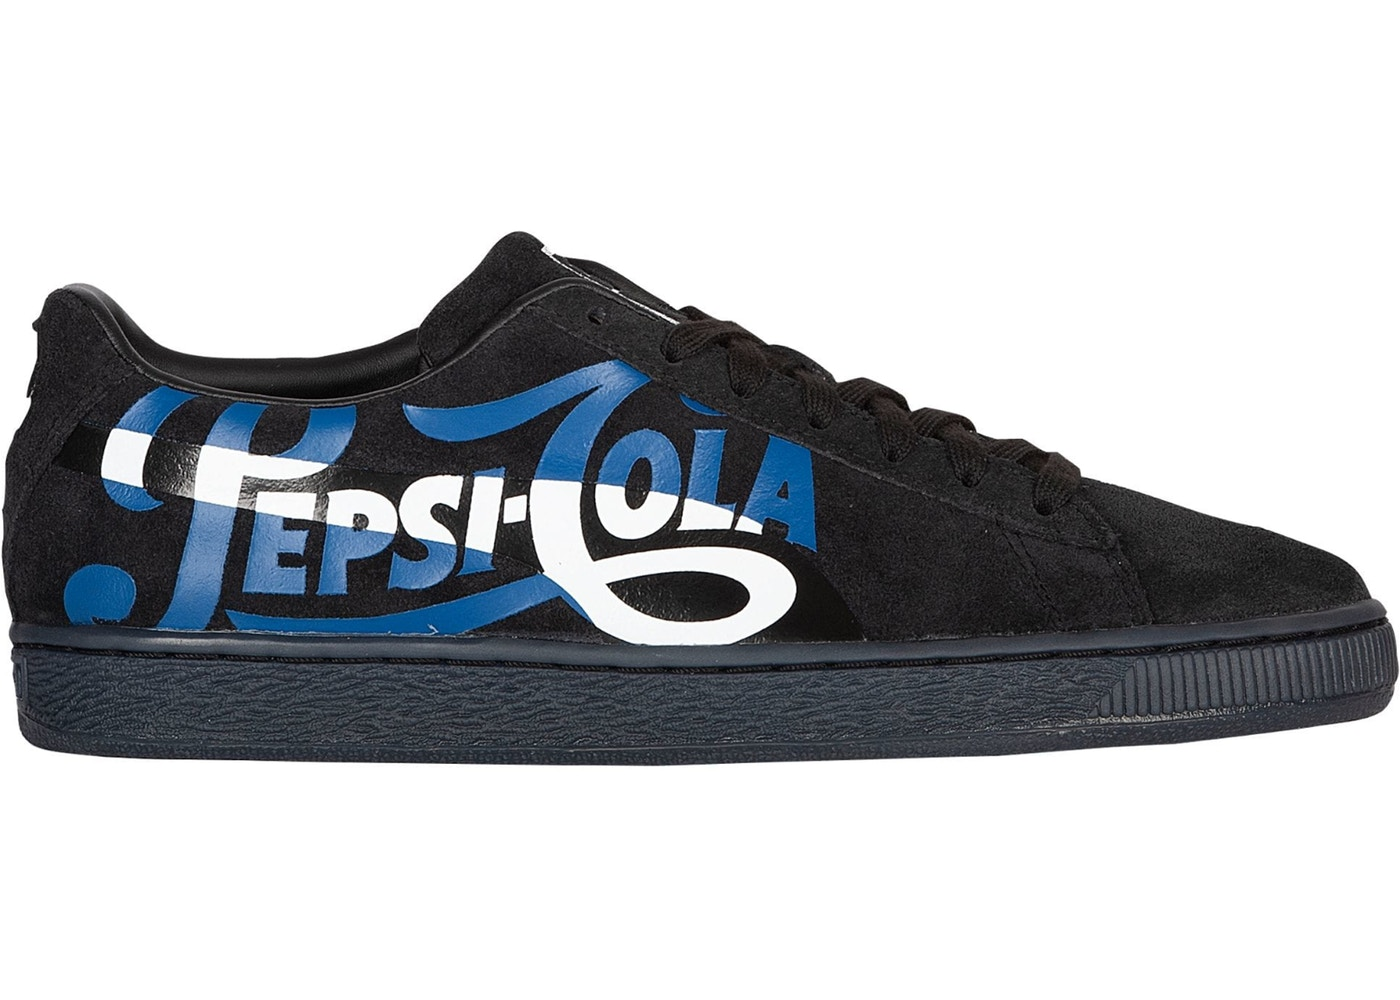 Puma Size 12 Shoes Lowest Ask